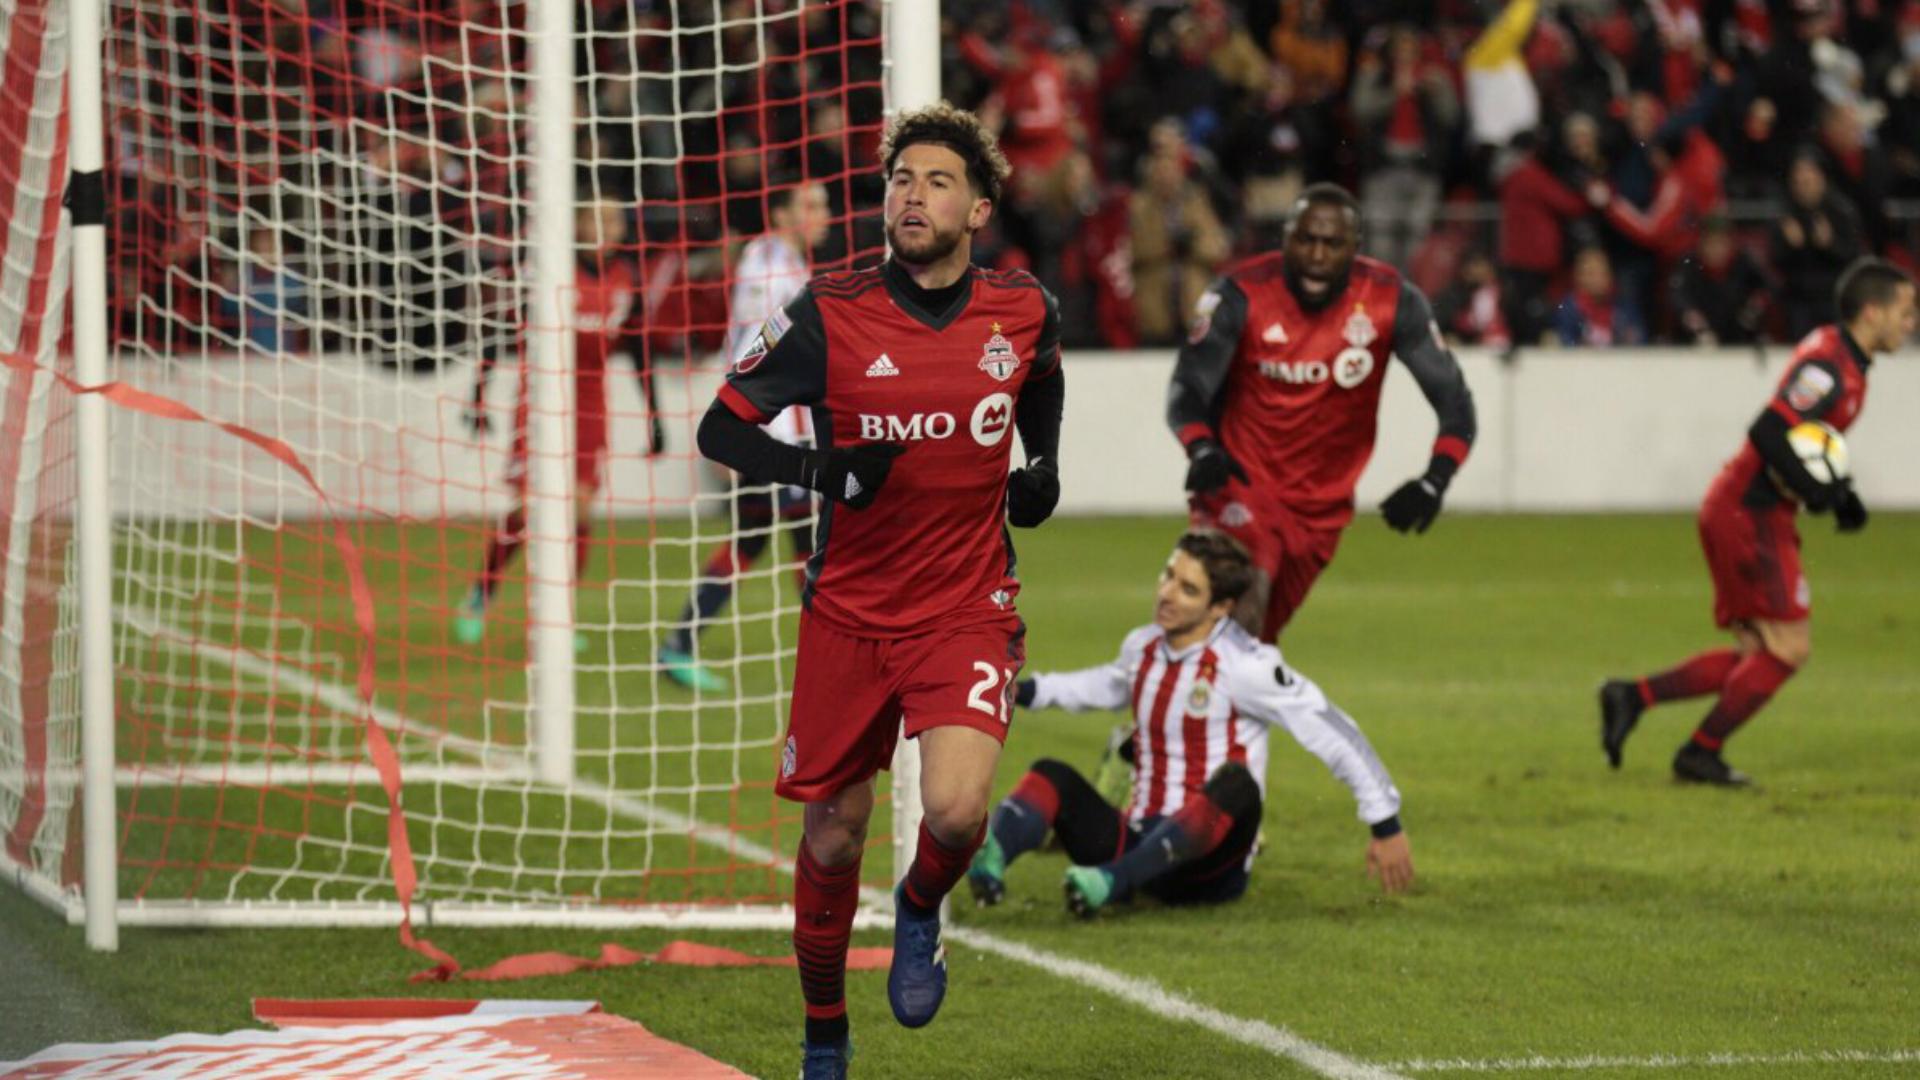 Toronto FC vs Chivas de Guadalajara, Concachampions 2018 — Final en vivo